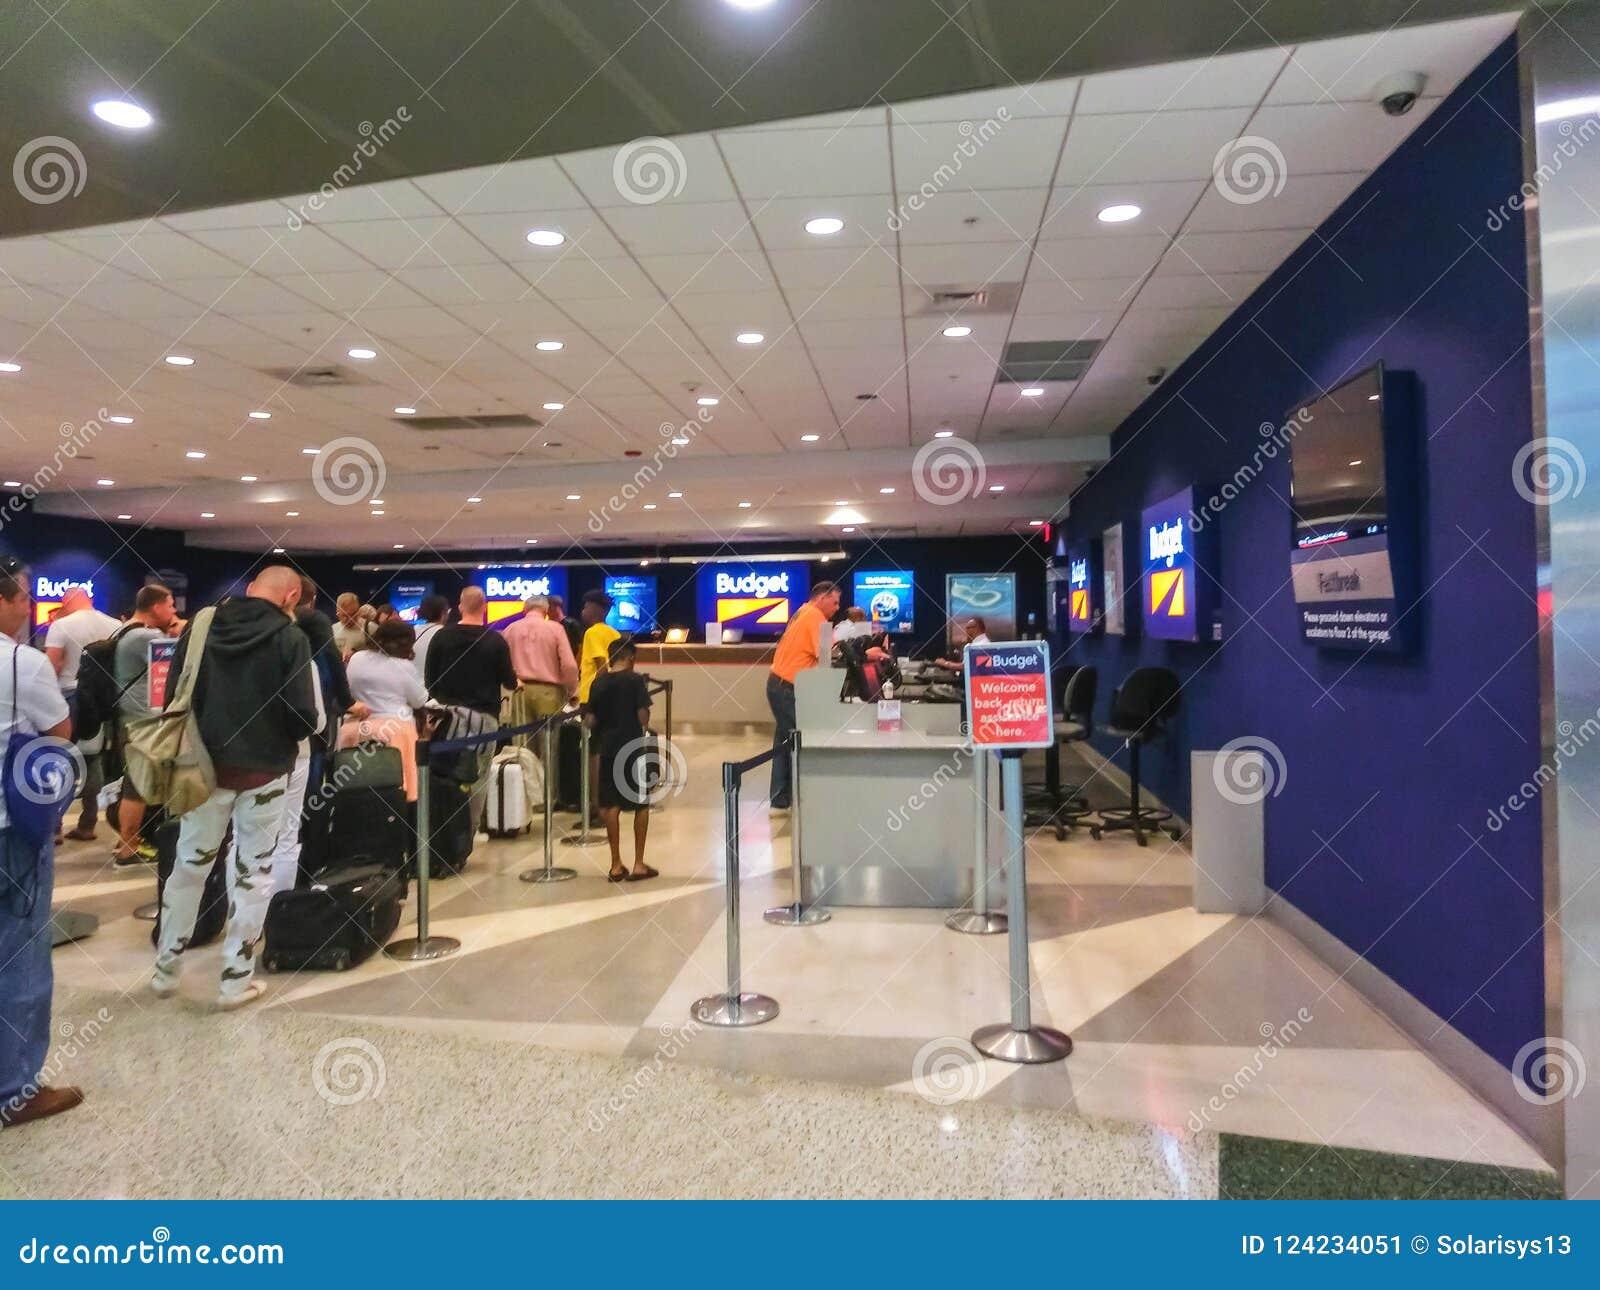 Miami, Florida, USA - Aprile 28, 2018: The Budget rental car office at Miami airport